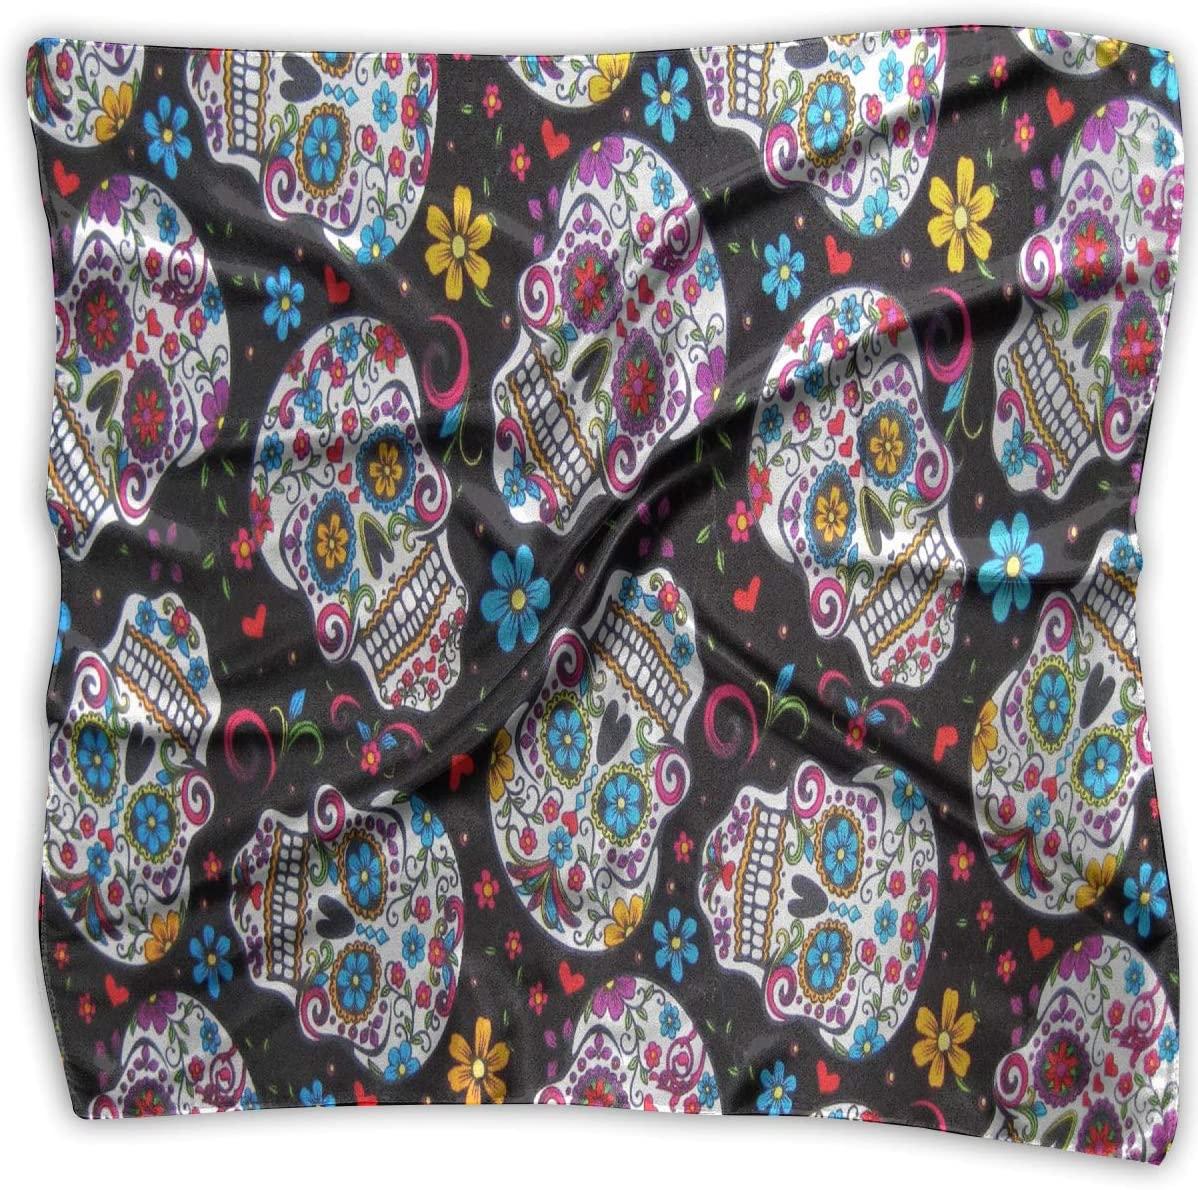 WFIRE Flowers Sugar Skull Square Handkerchiefs Scarf Shawl Bandanas Headscarf Neckerchief Tie Hair Scarf